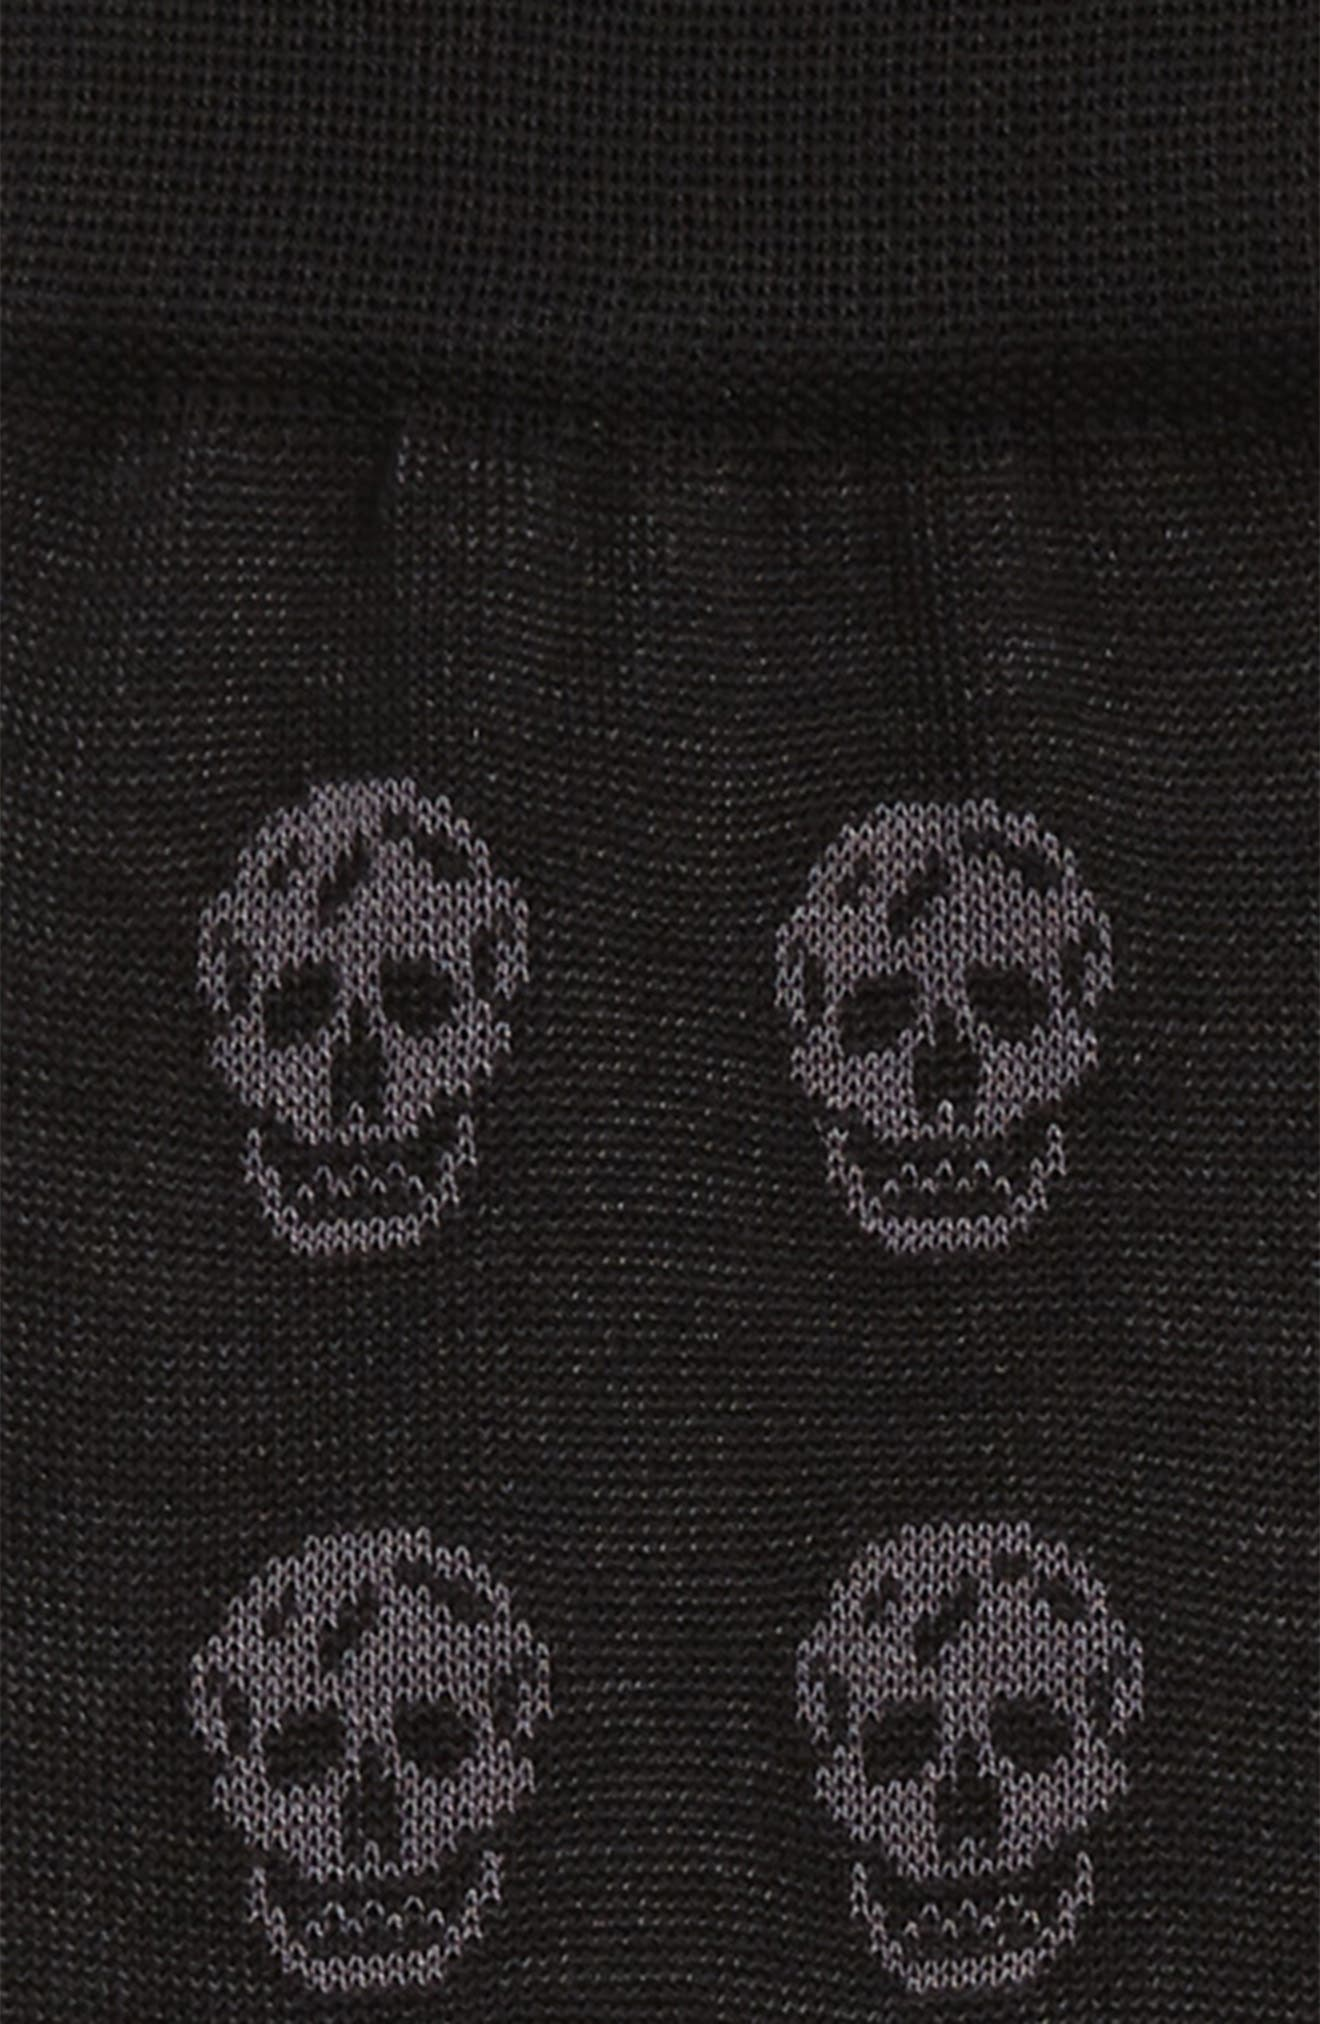 ALEXANDER MCQUEEN,                             Skull Socks,                             Alternate thumbnail 2, color,                             BLACK AND GREY